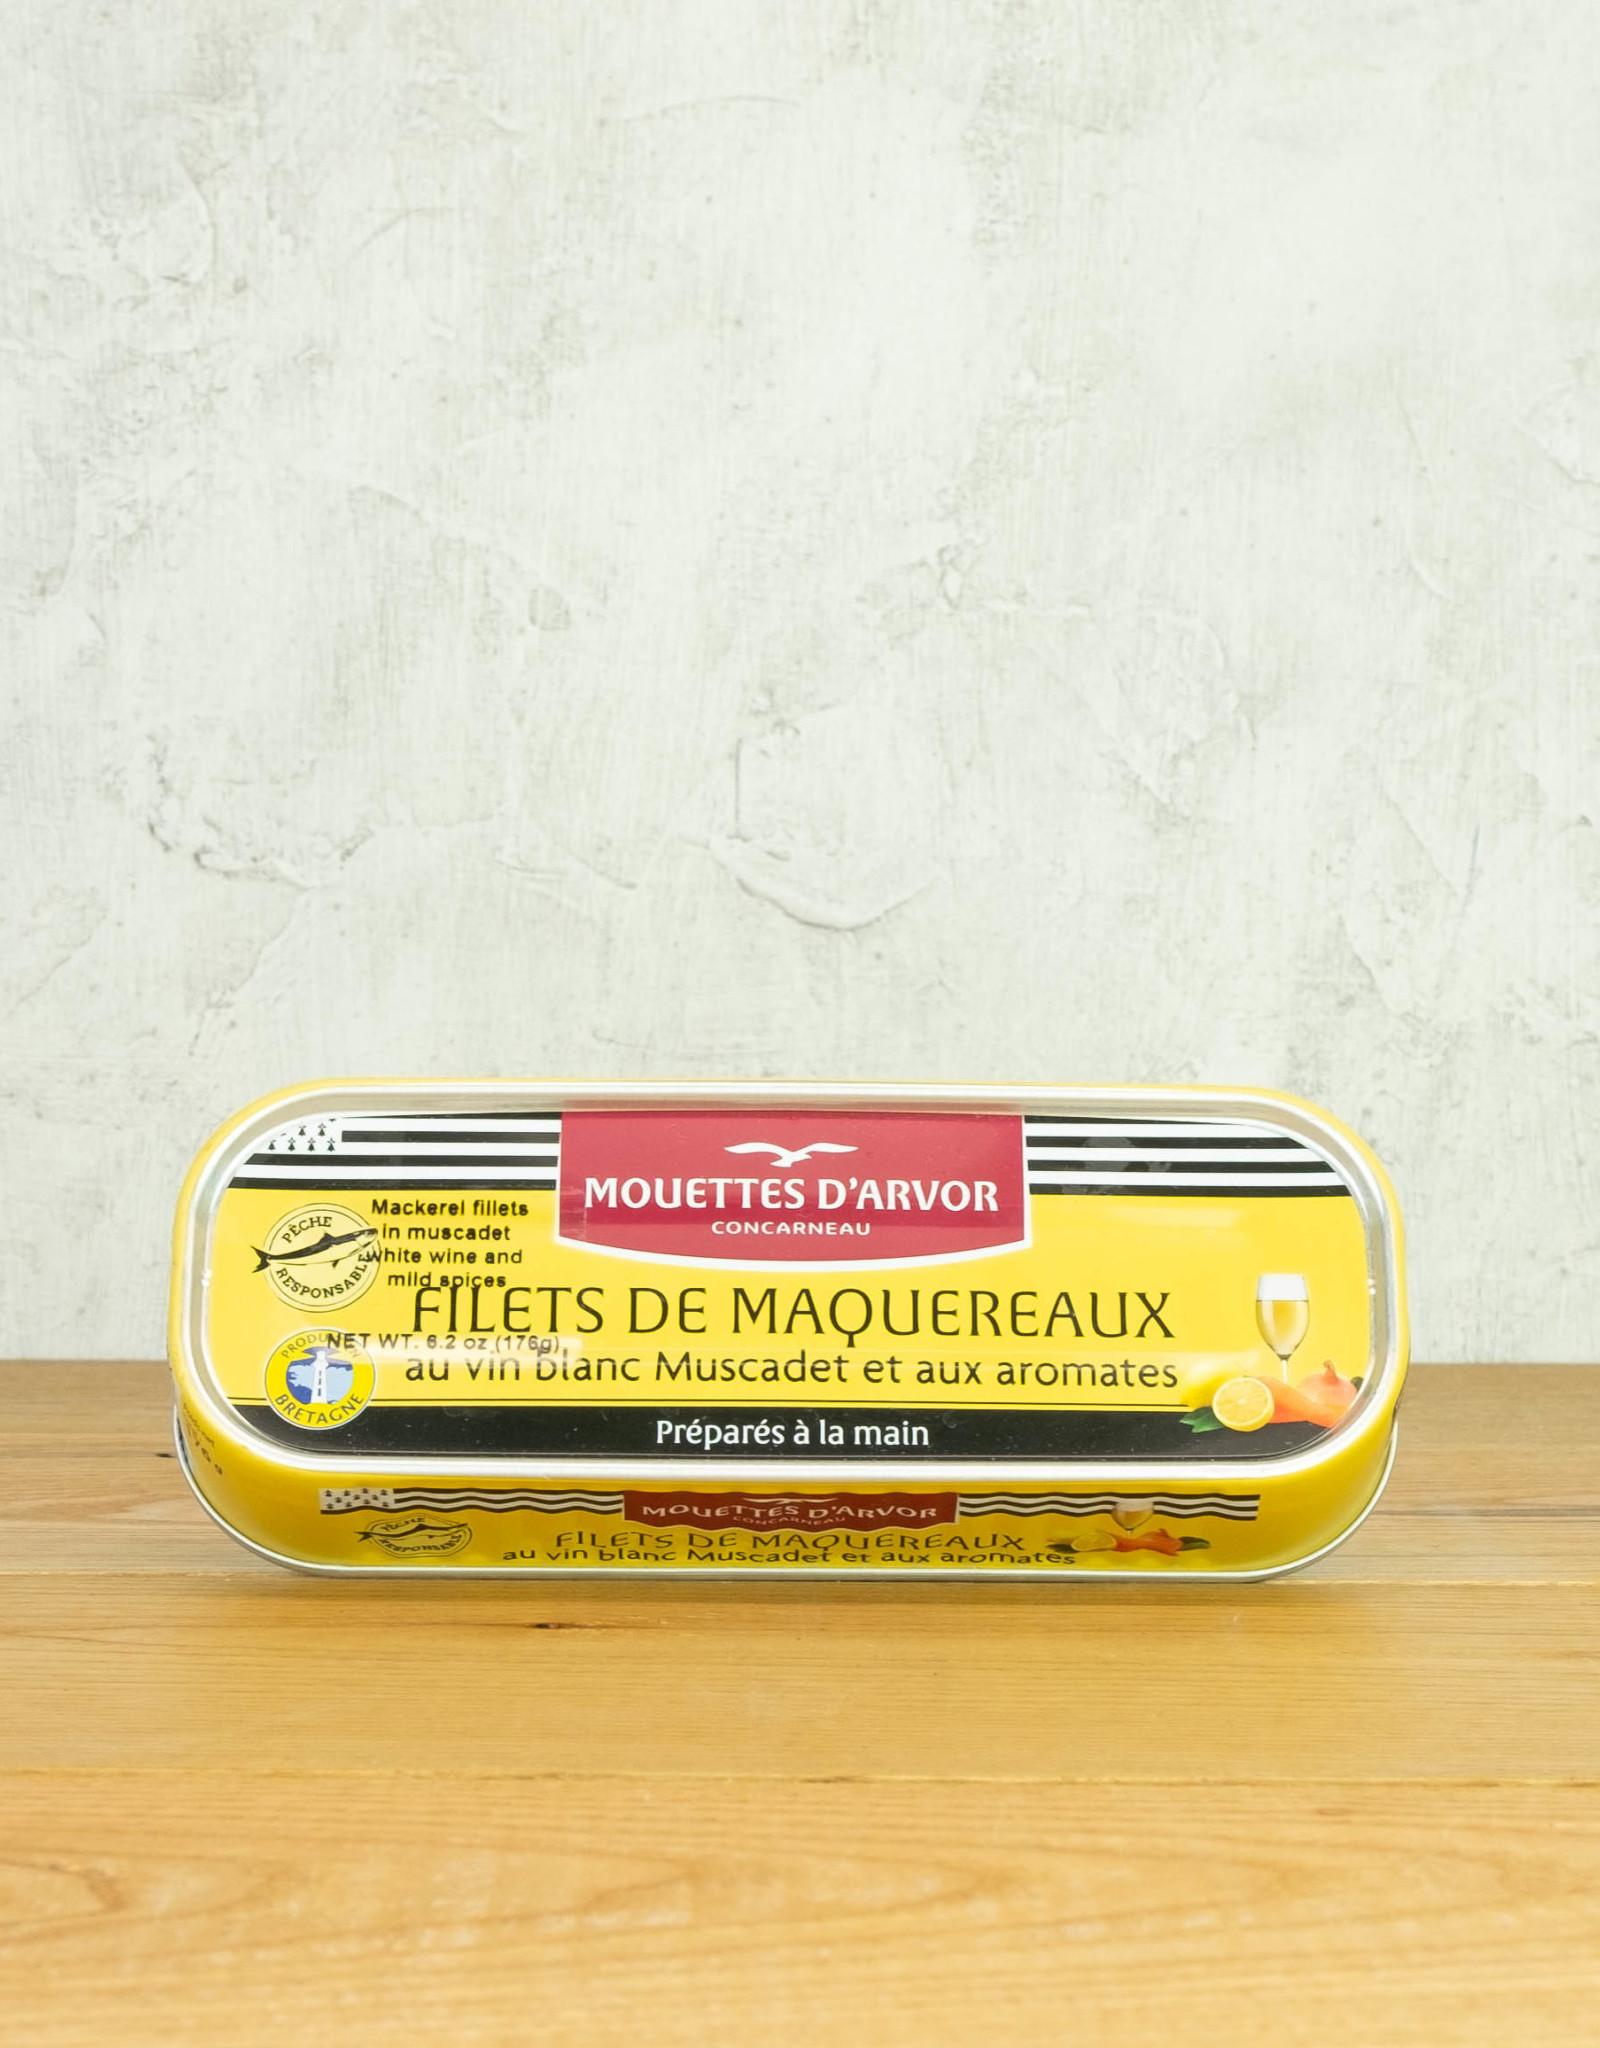 Les Mouettes d'Arvor Mackerel in Muscadet w/ Herbs